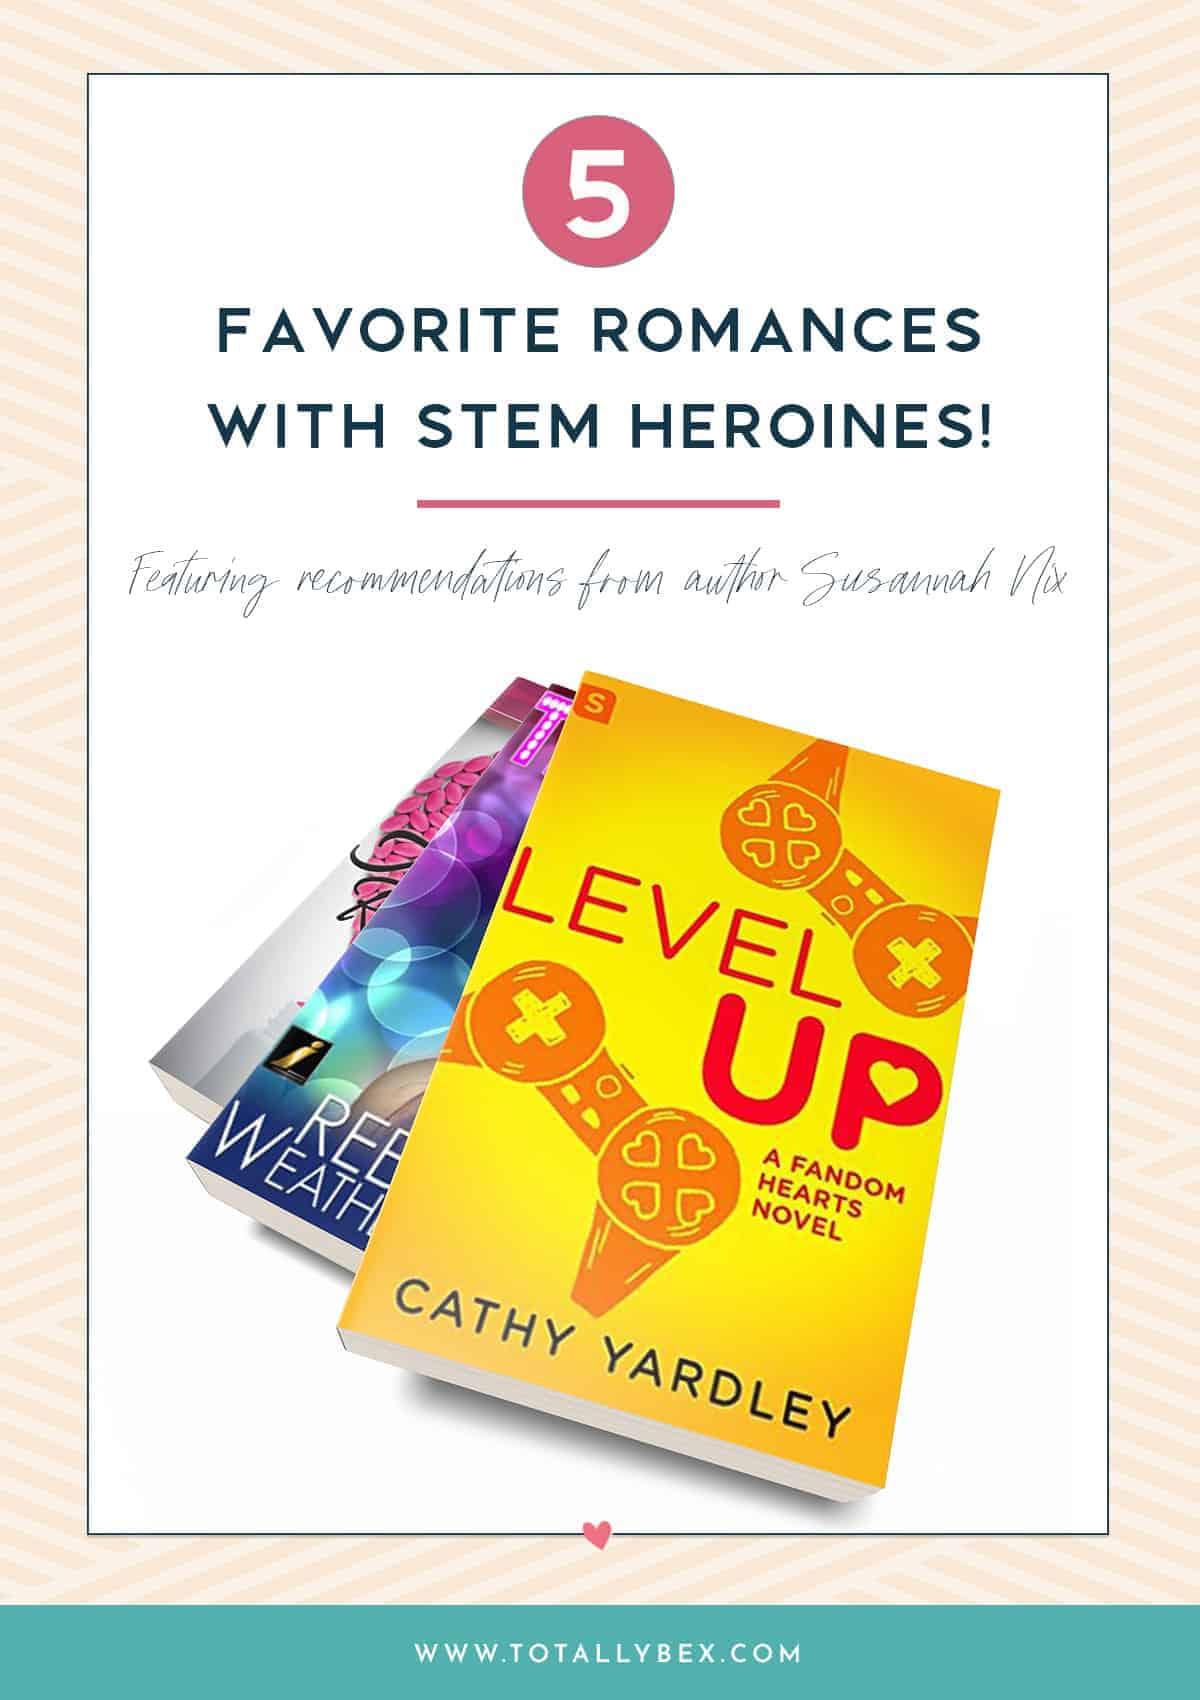 5 Favorite Romances with STEM Heroines